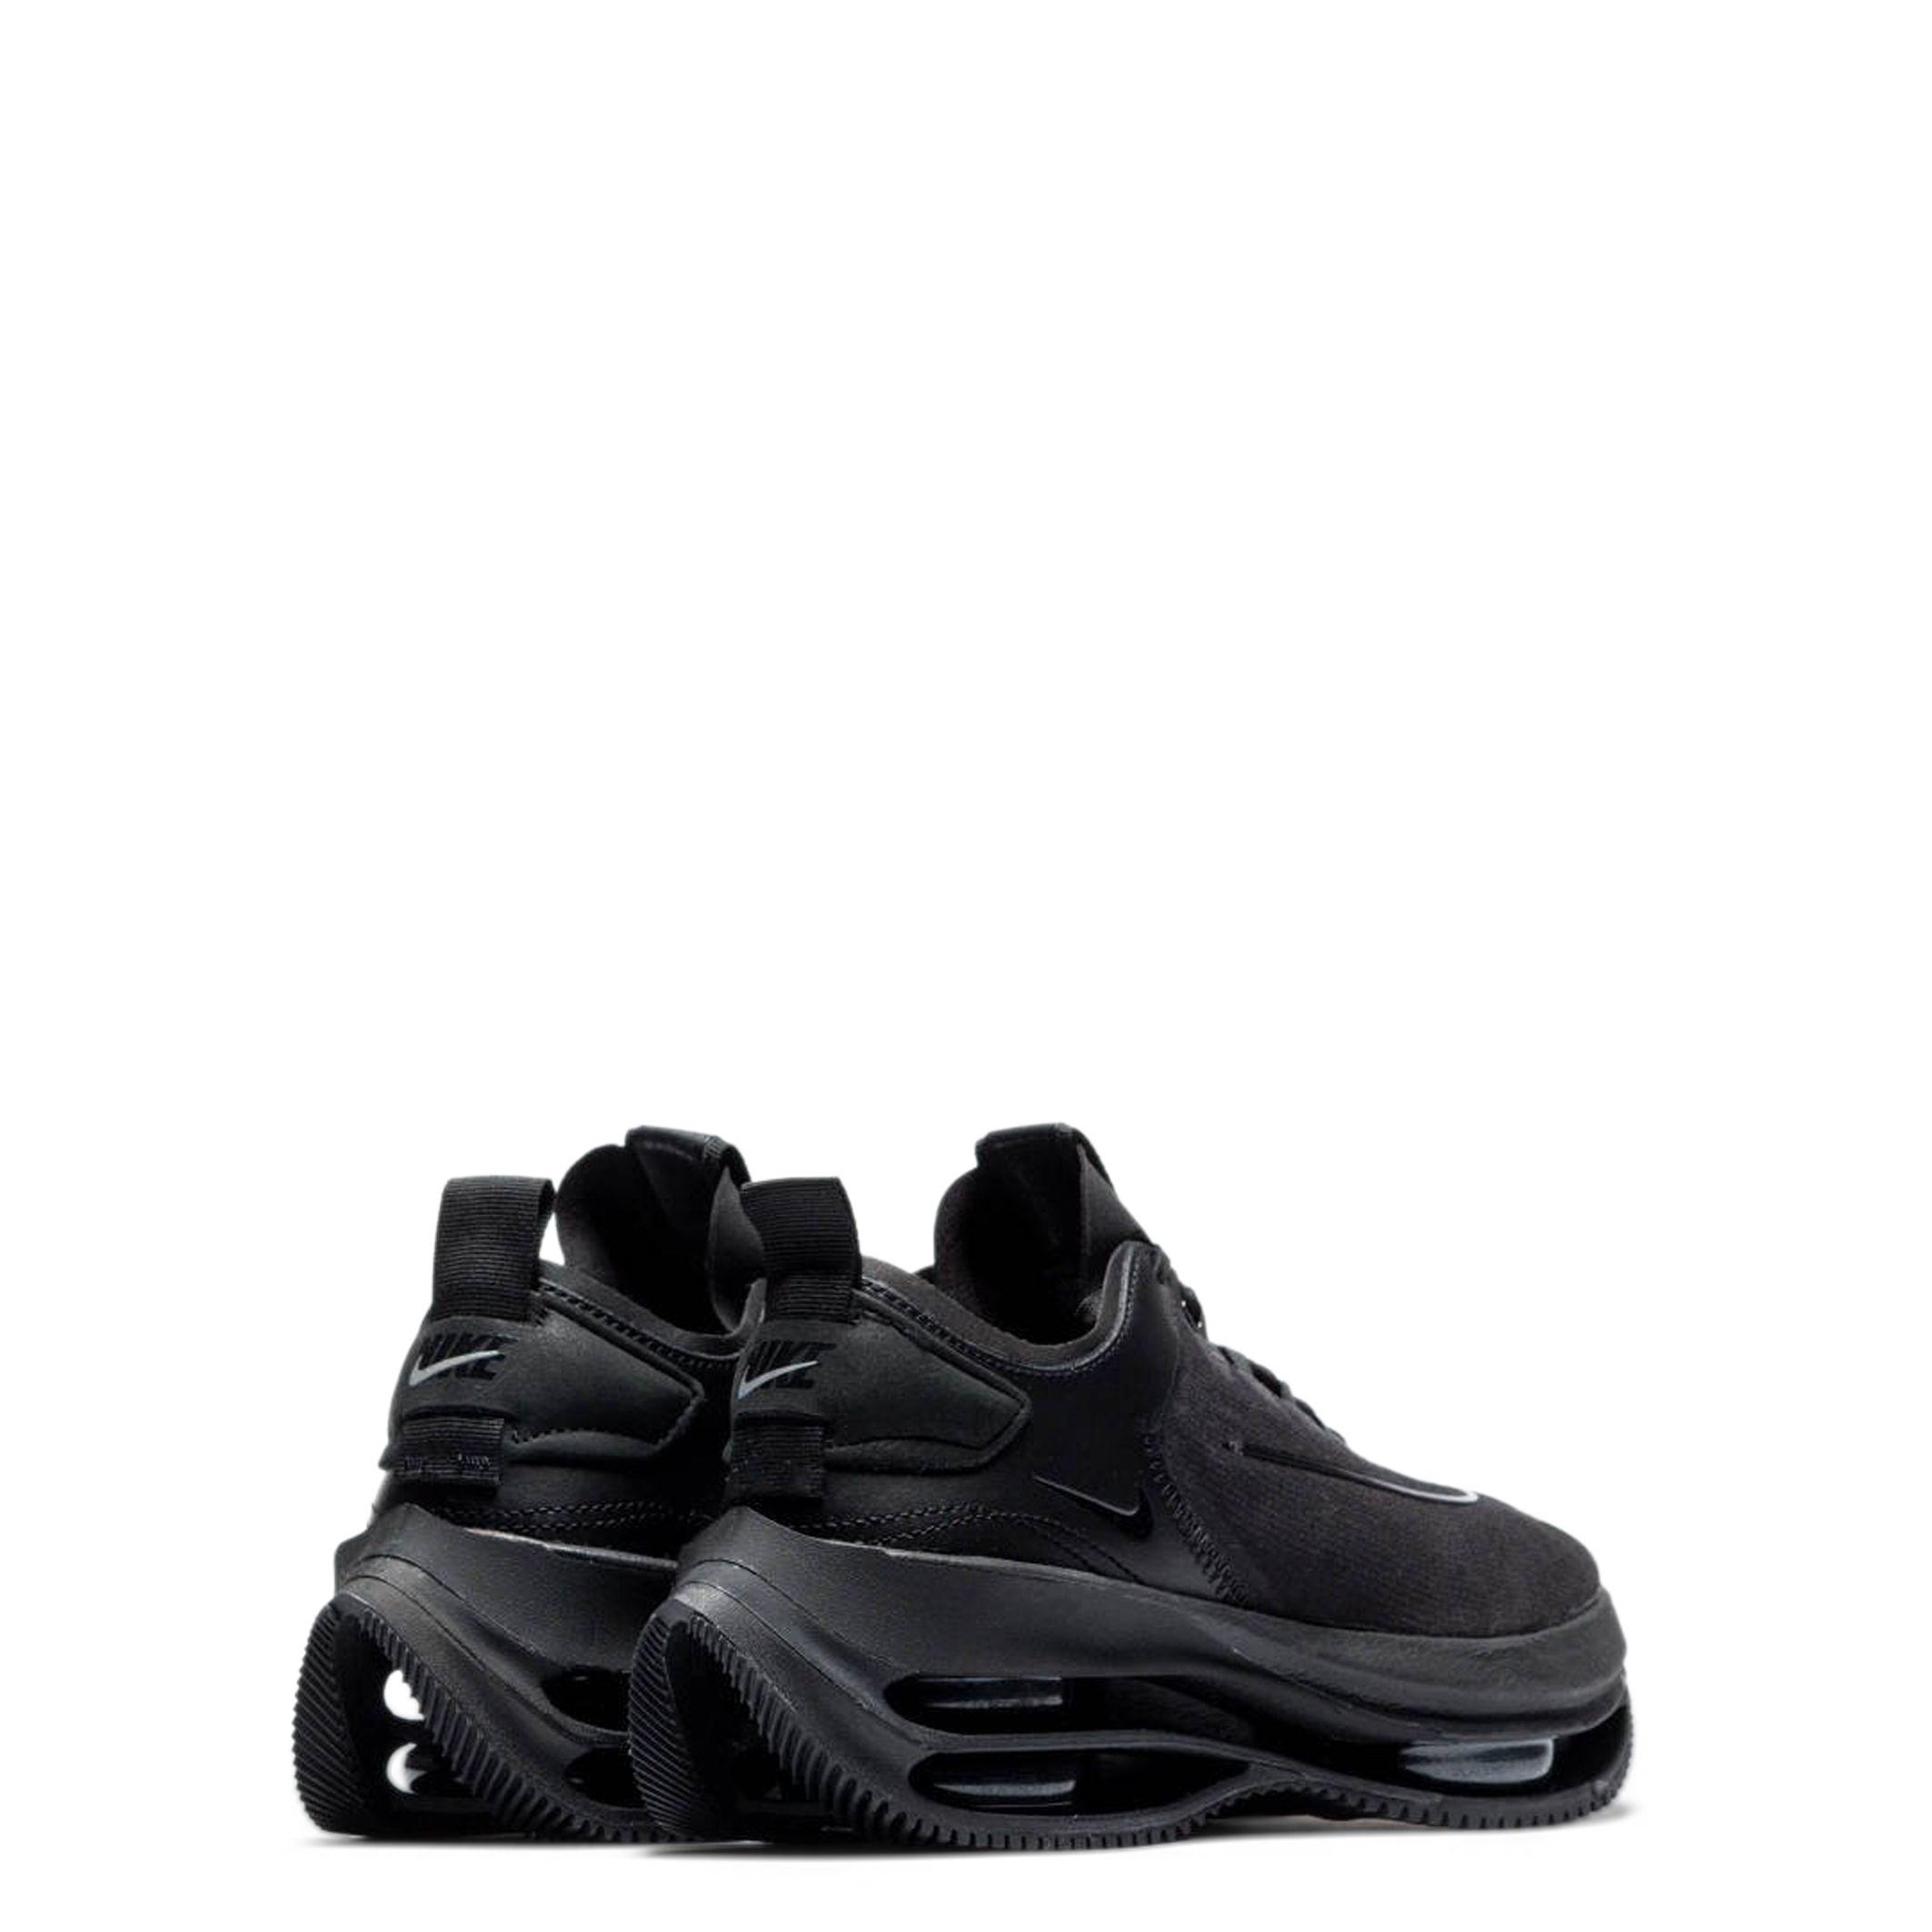 E99F9470 6D21 11Eb 8C4F C5B33833D7F6 Nike - W-Zoomdoublestacked - Black